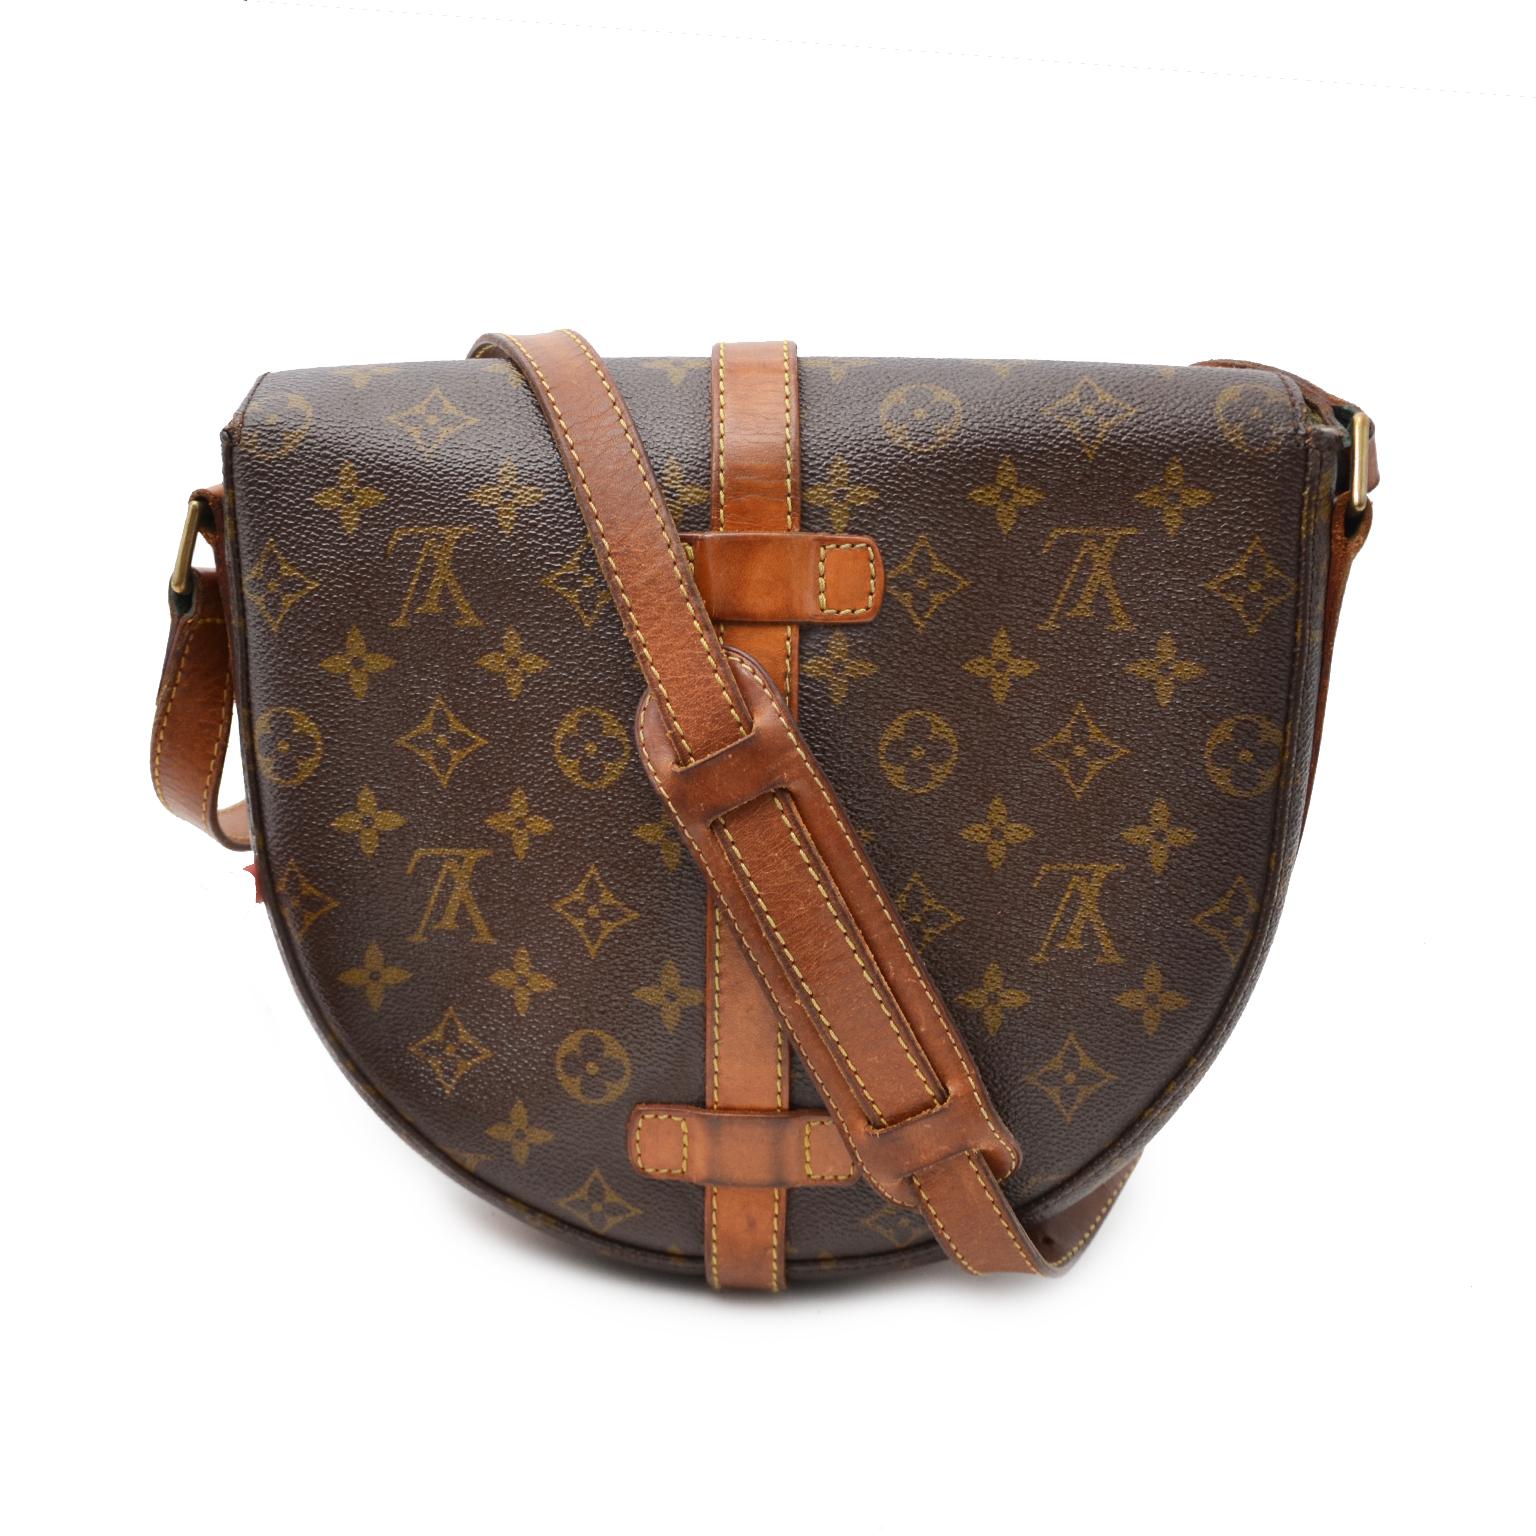 436b994749d0 ... Shop luxury items in Antwerp like Louis Vuitton Monogram Chantilly Bag